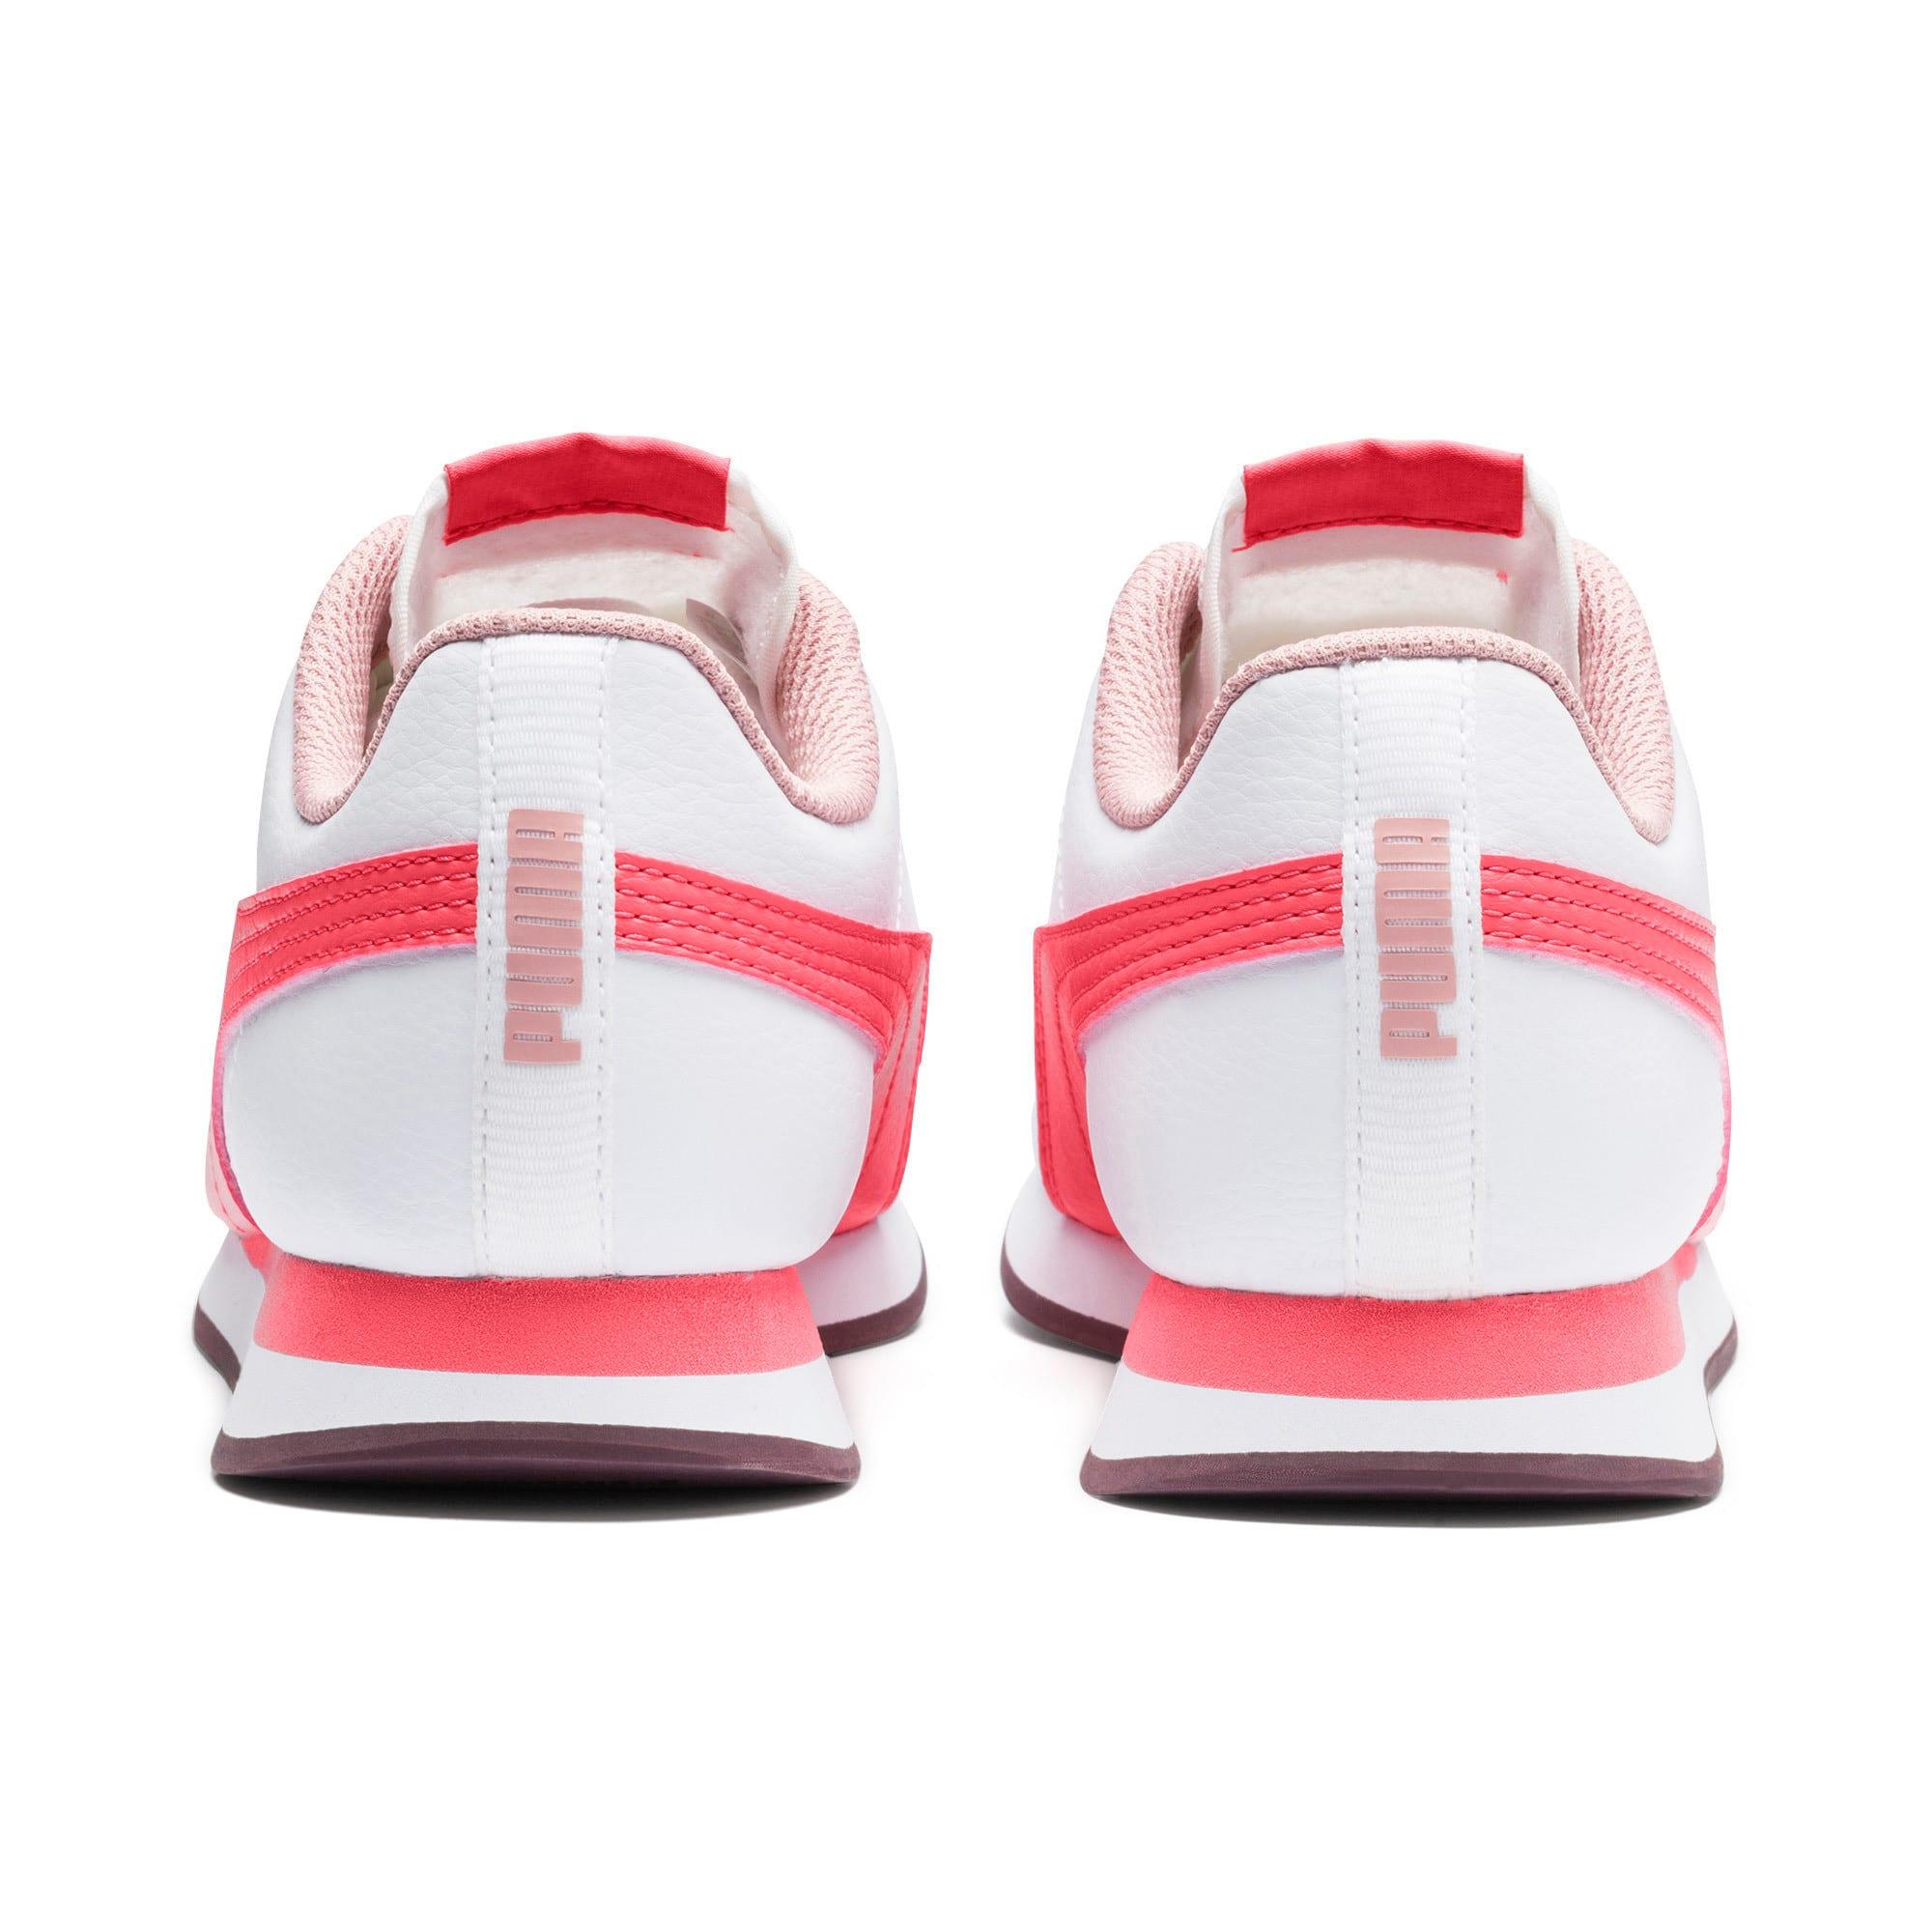 Miniatura 3 de Zapatos deportivos Turin II para JR, Puma White-Calypso Coral, mediano